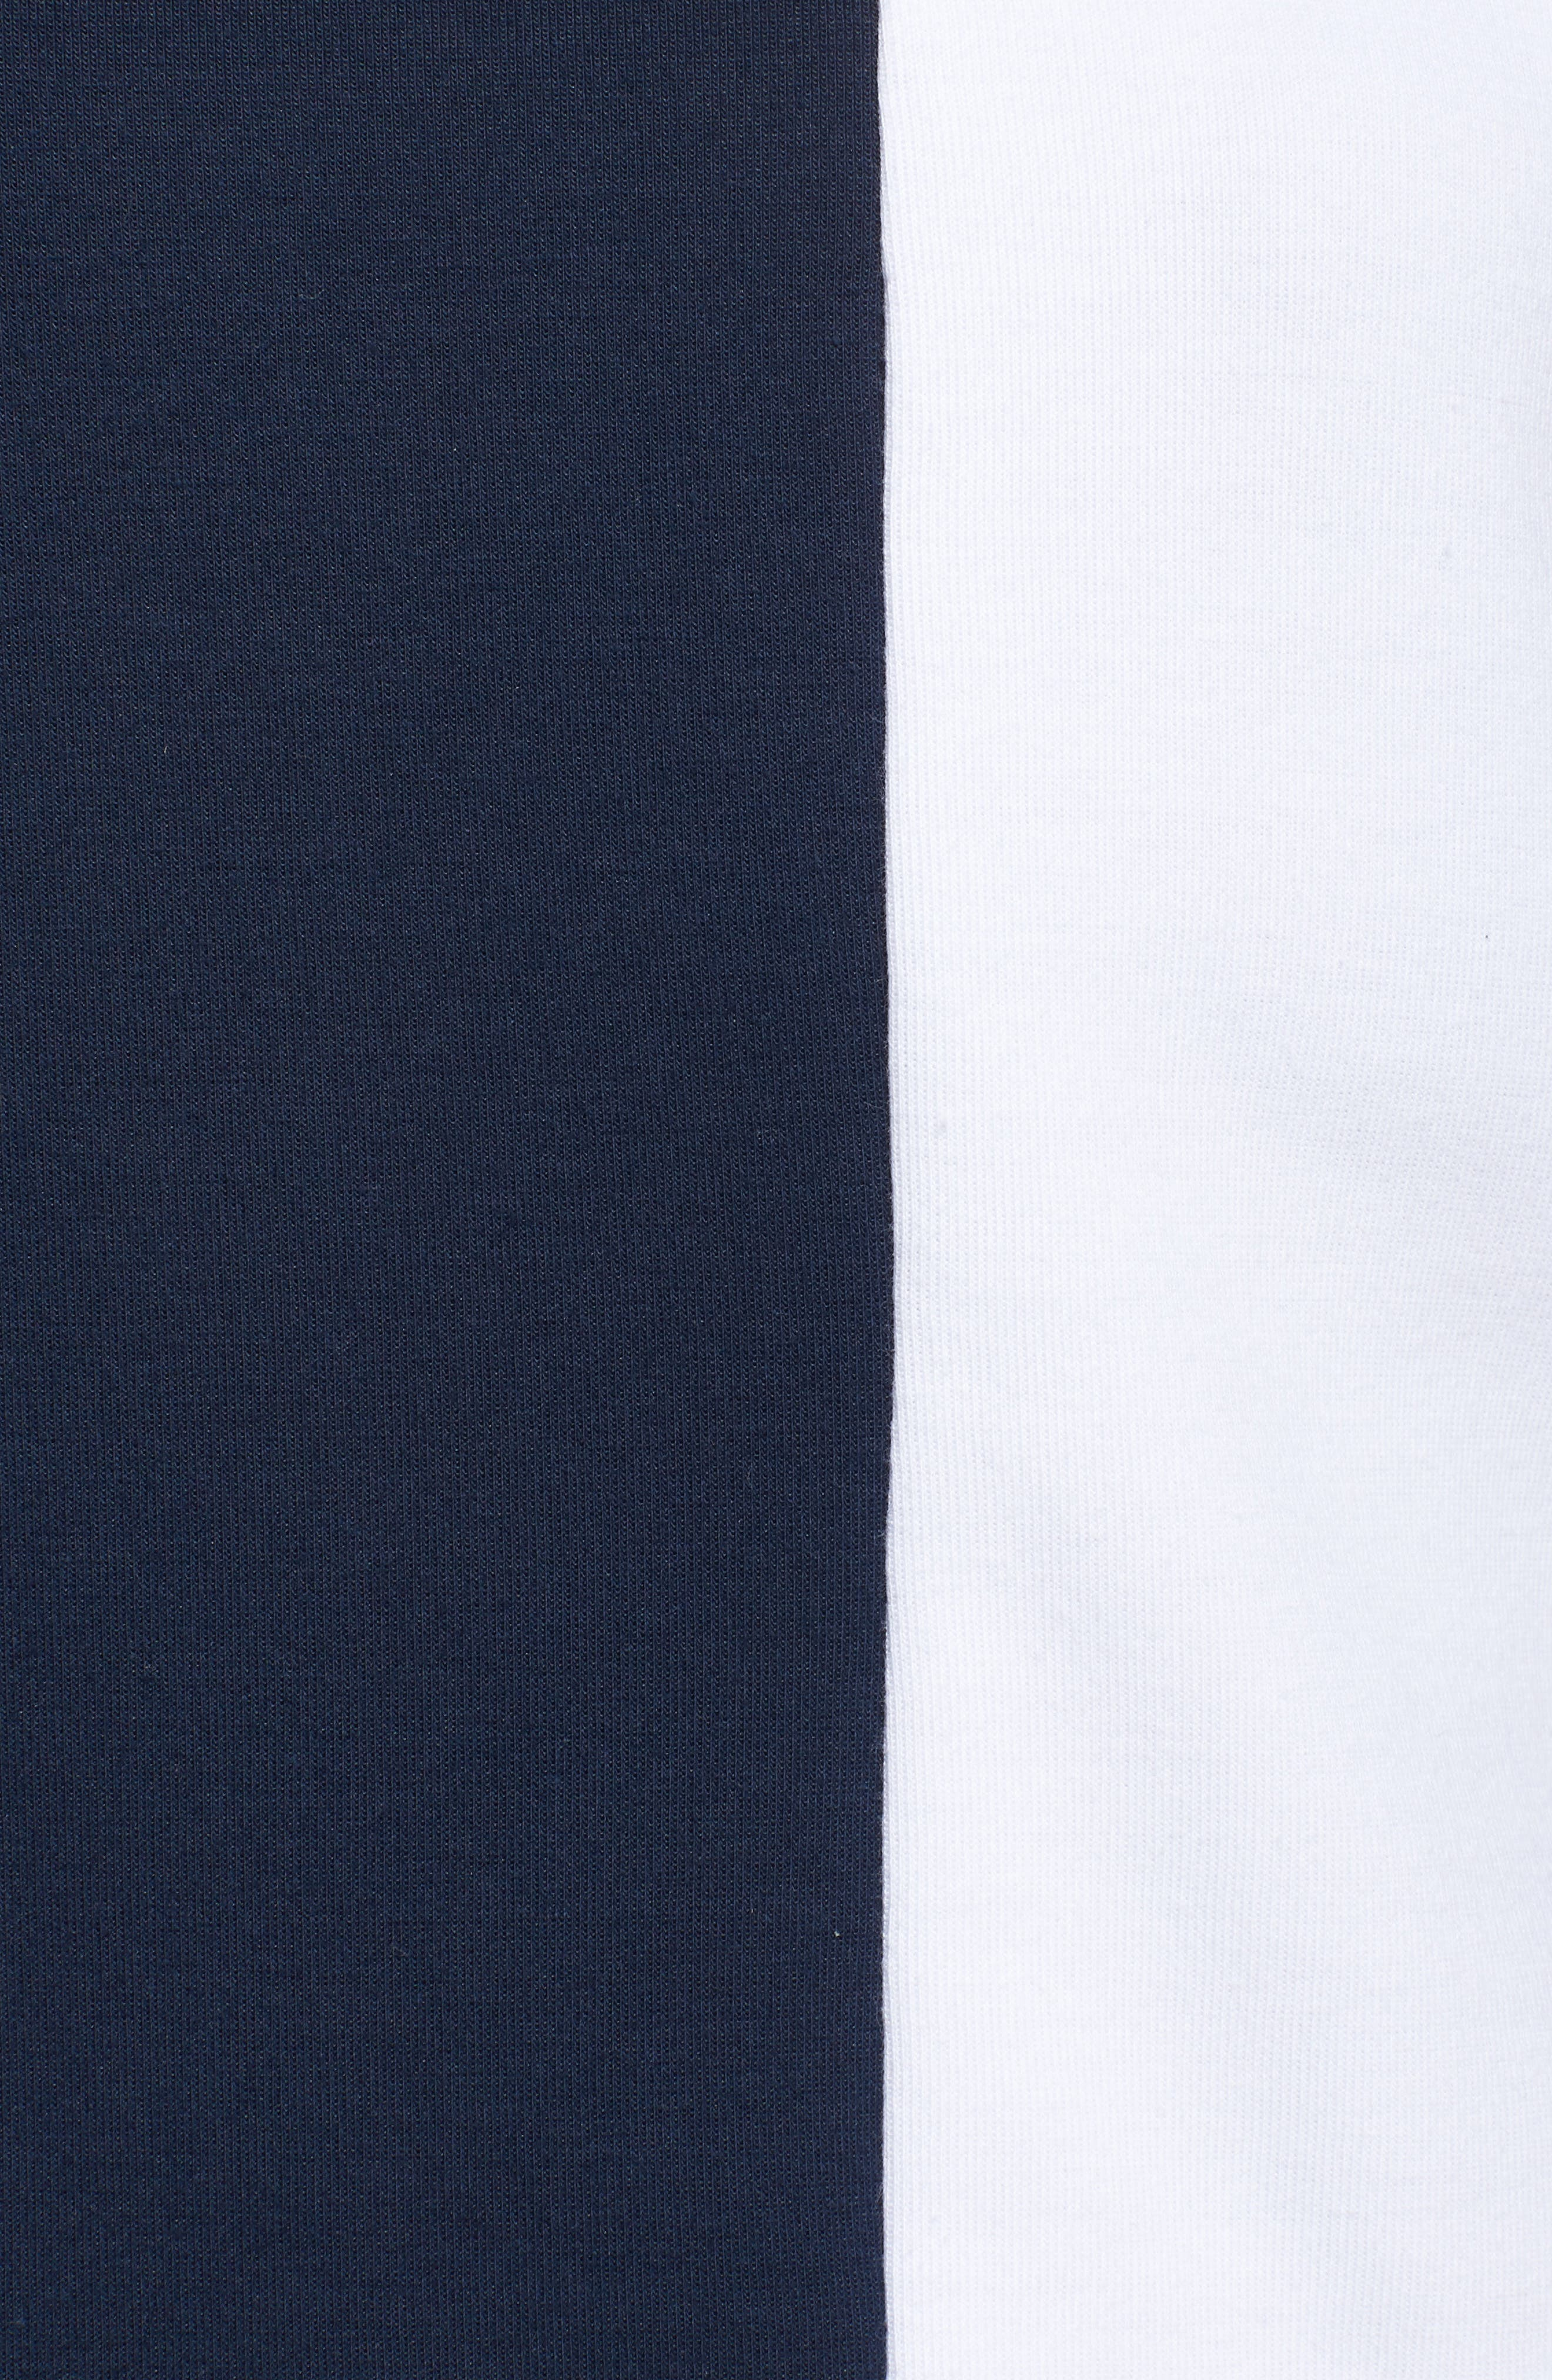 Crop Colorblock Turtleneck,                             Alternate thumbnail 6, color,                             Collegiate Navy